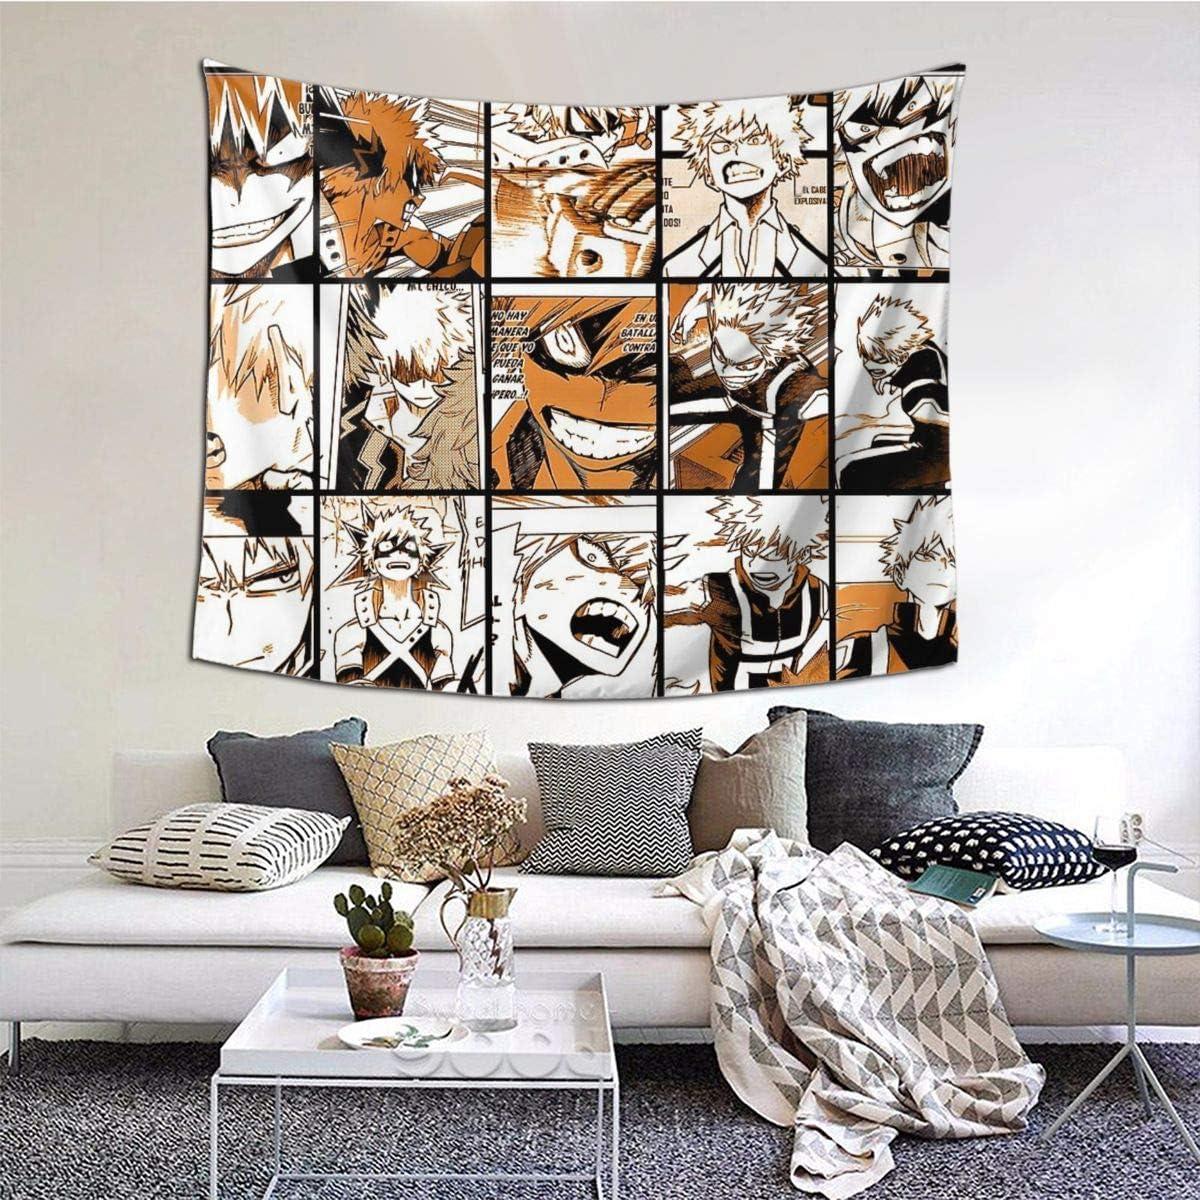 Zilld Bakugo Katsuki Tapestry Wall Hanging Home Decorations for Living Room Bedroom Dorm Decor 60×51 inch